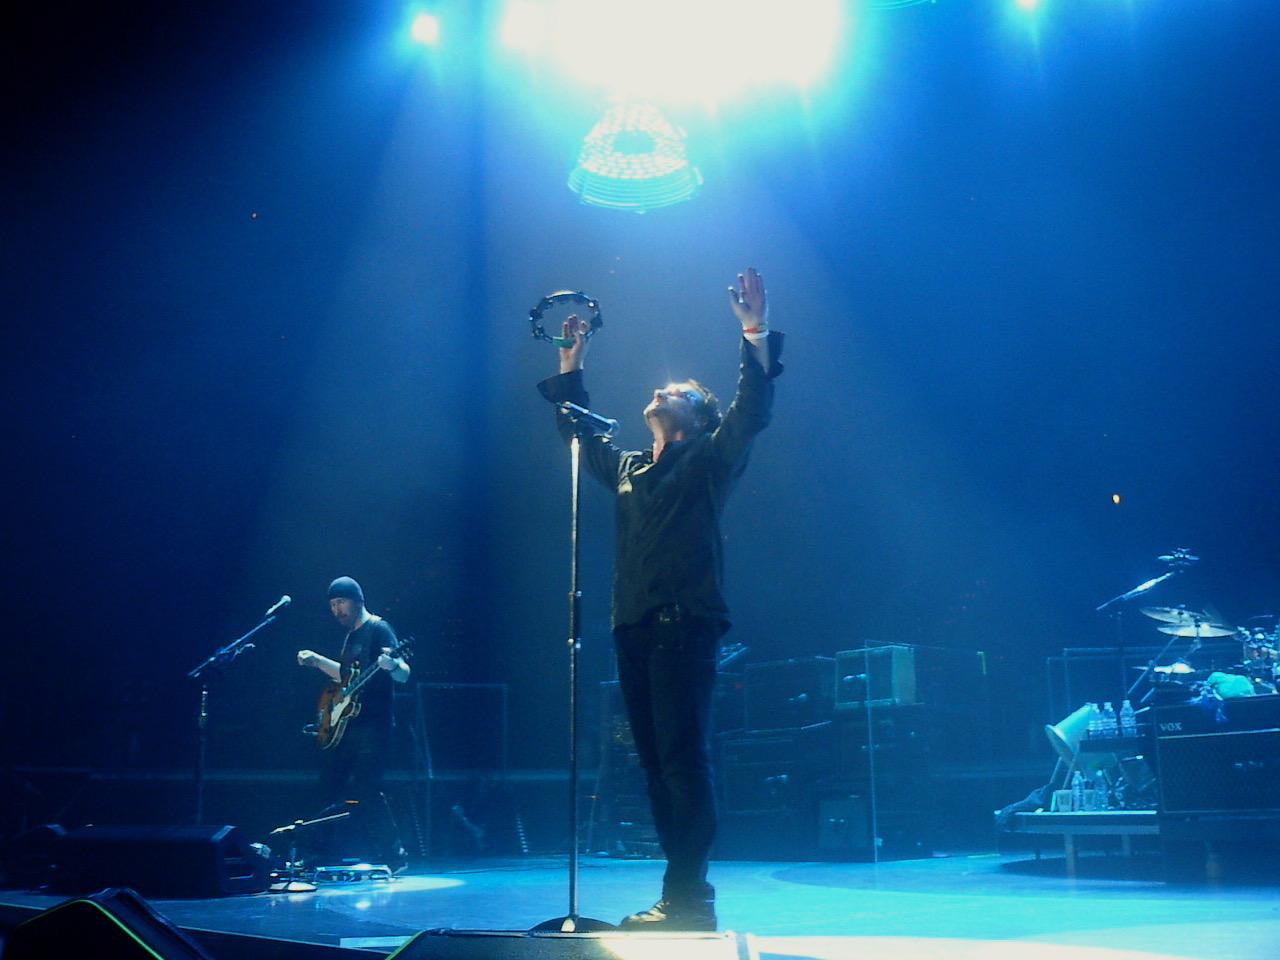 Bono live in concert